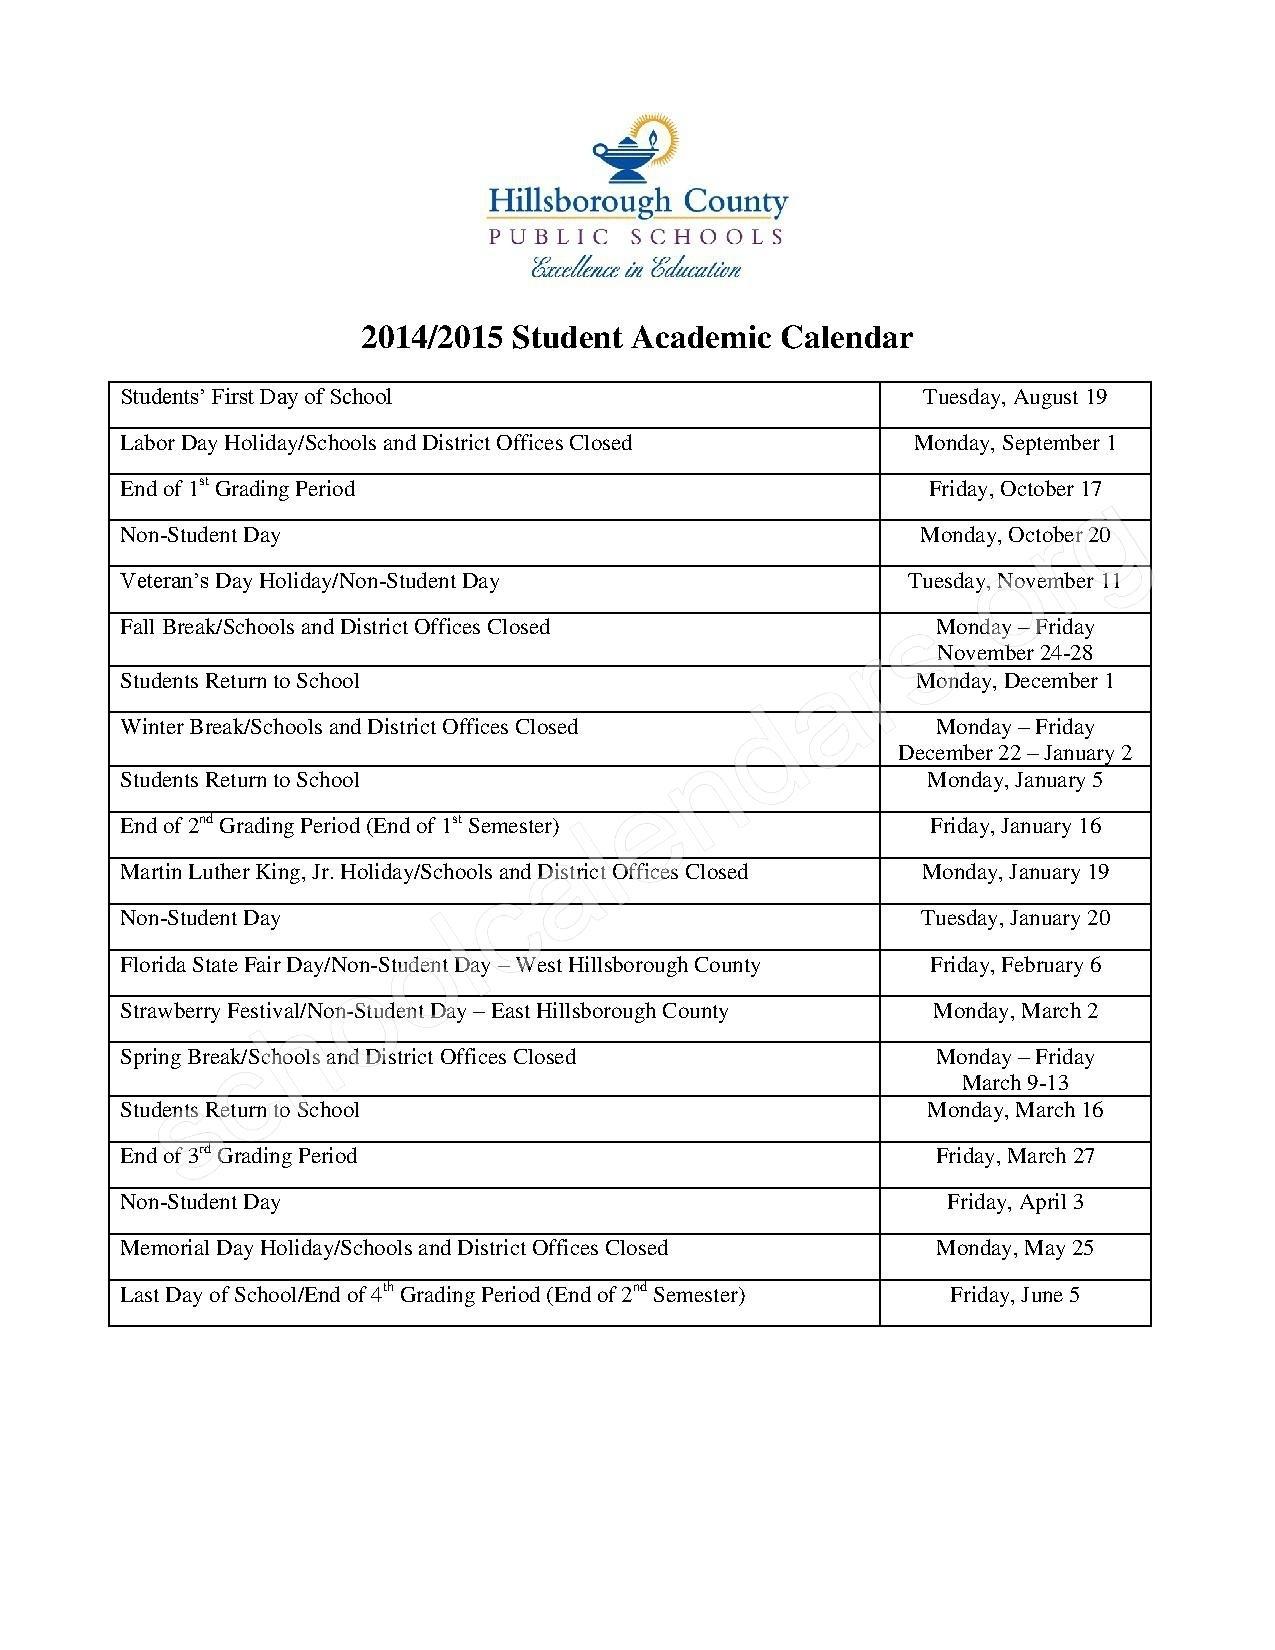 Hillsborough County School Calendar For 2018-19 | Isacl_Calendar School Hillsborough County